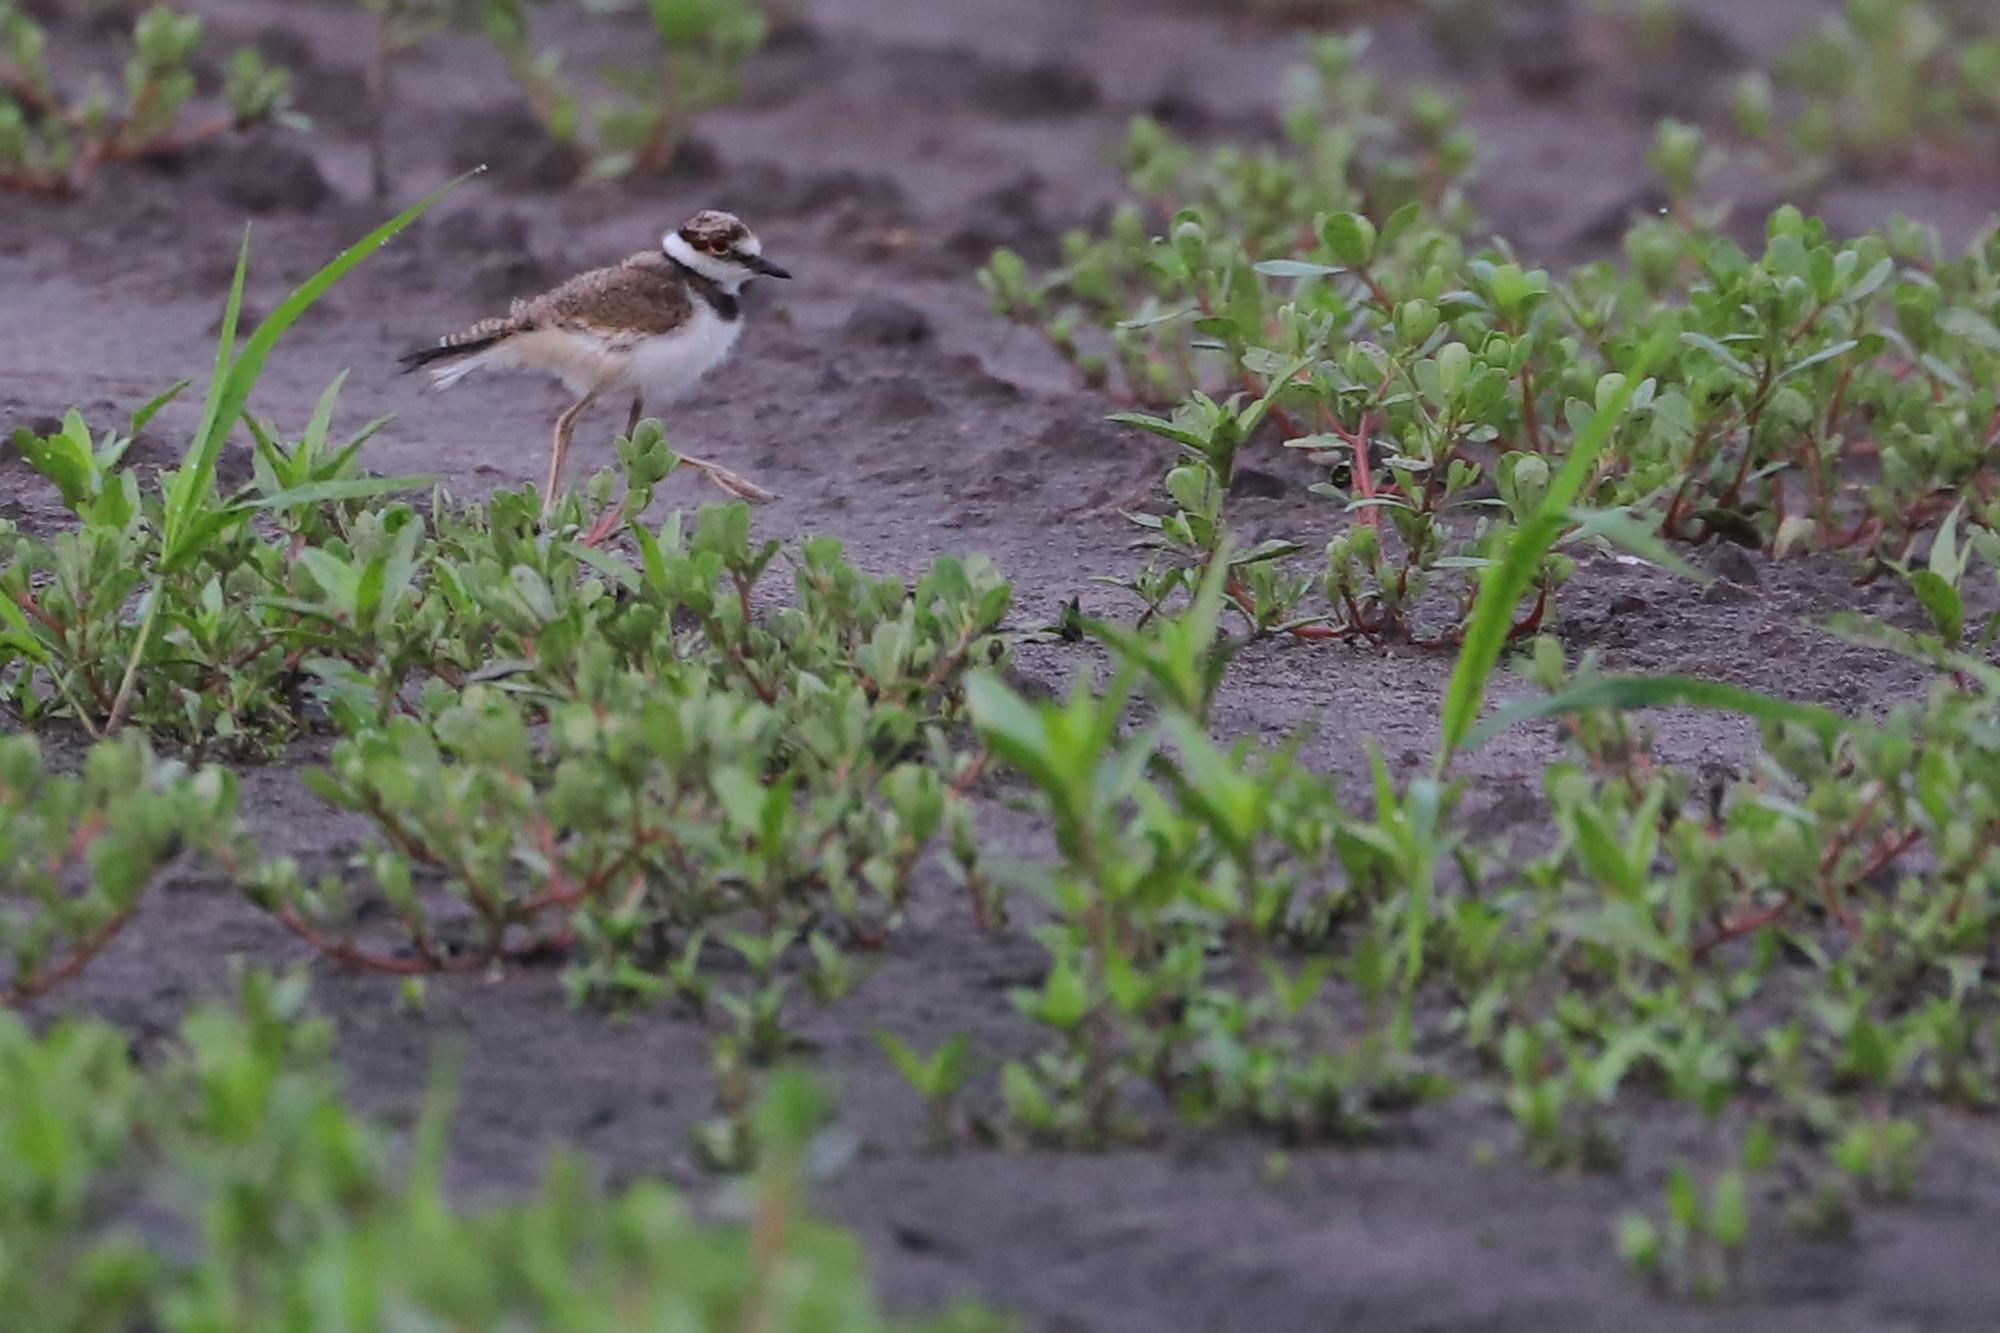 Killdeer fledgling / 6 Jul / Muddy Creek Rd.